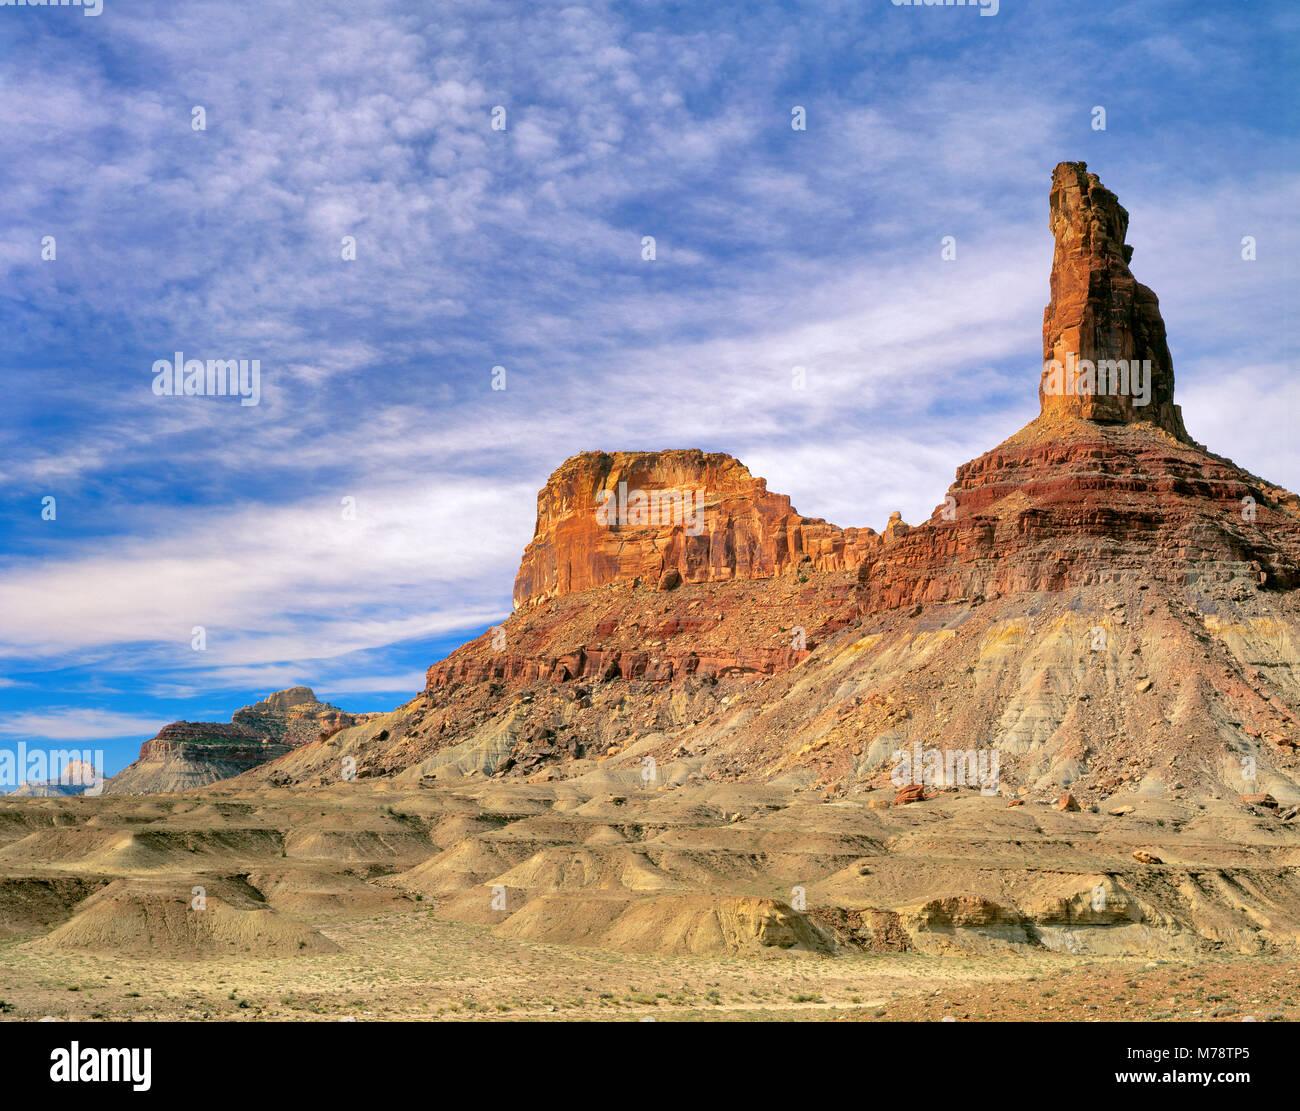 Bottleneck Peak, Buckhorn Wash, San Rafael Swell, Utah - Stock Image